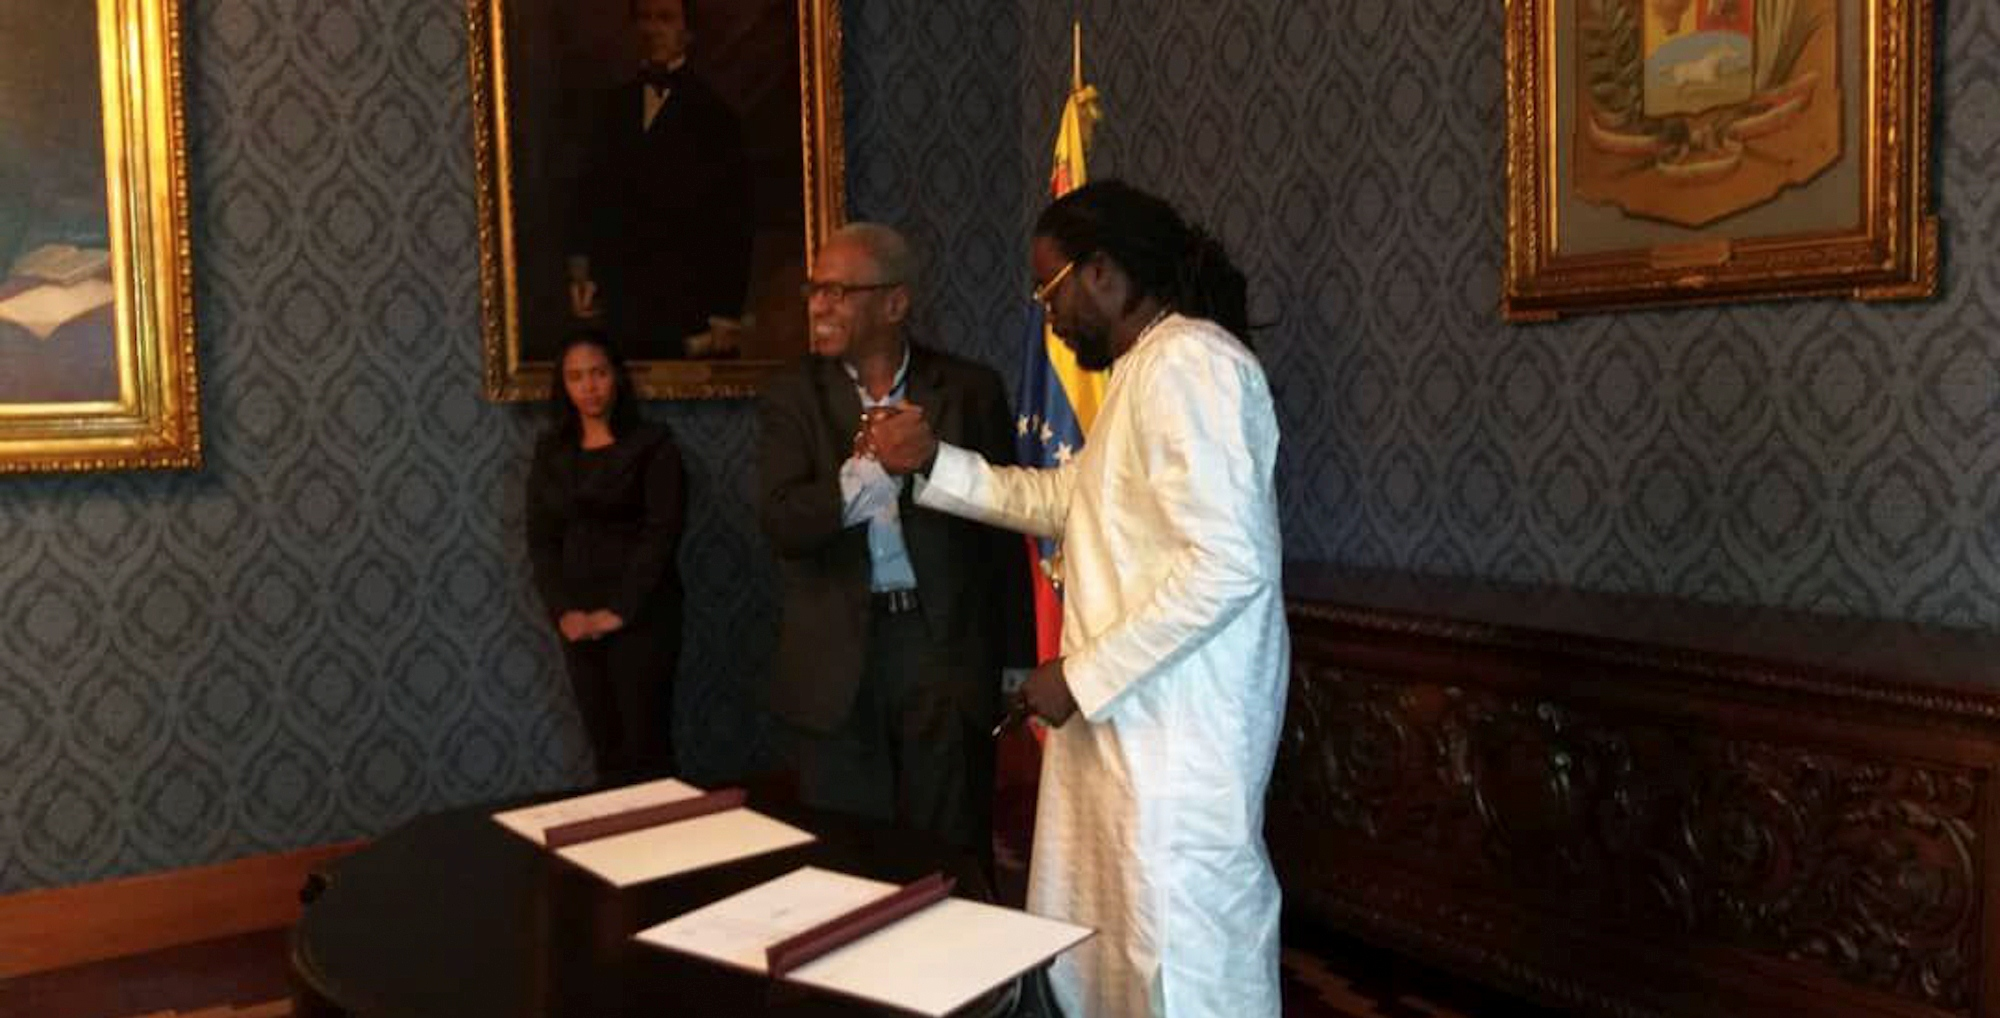 Organización Sonidos de África y Fundación Grupo Madera estrechan lazos de cooperación